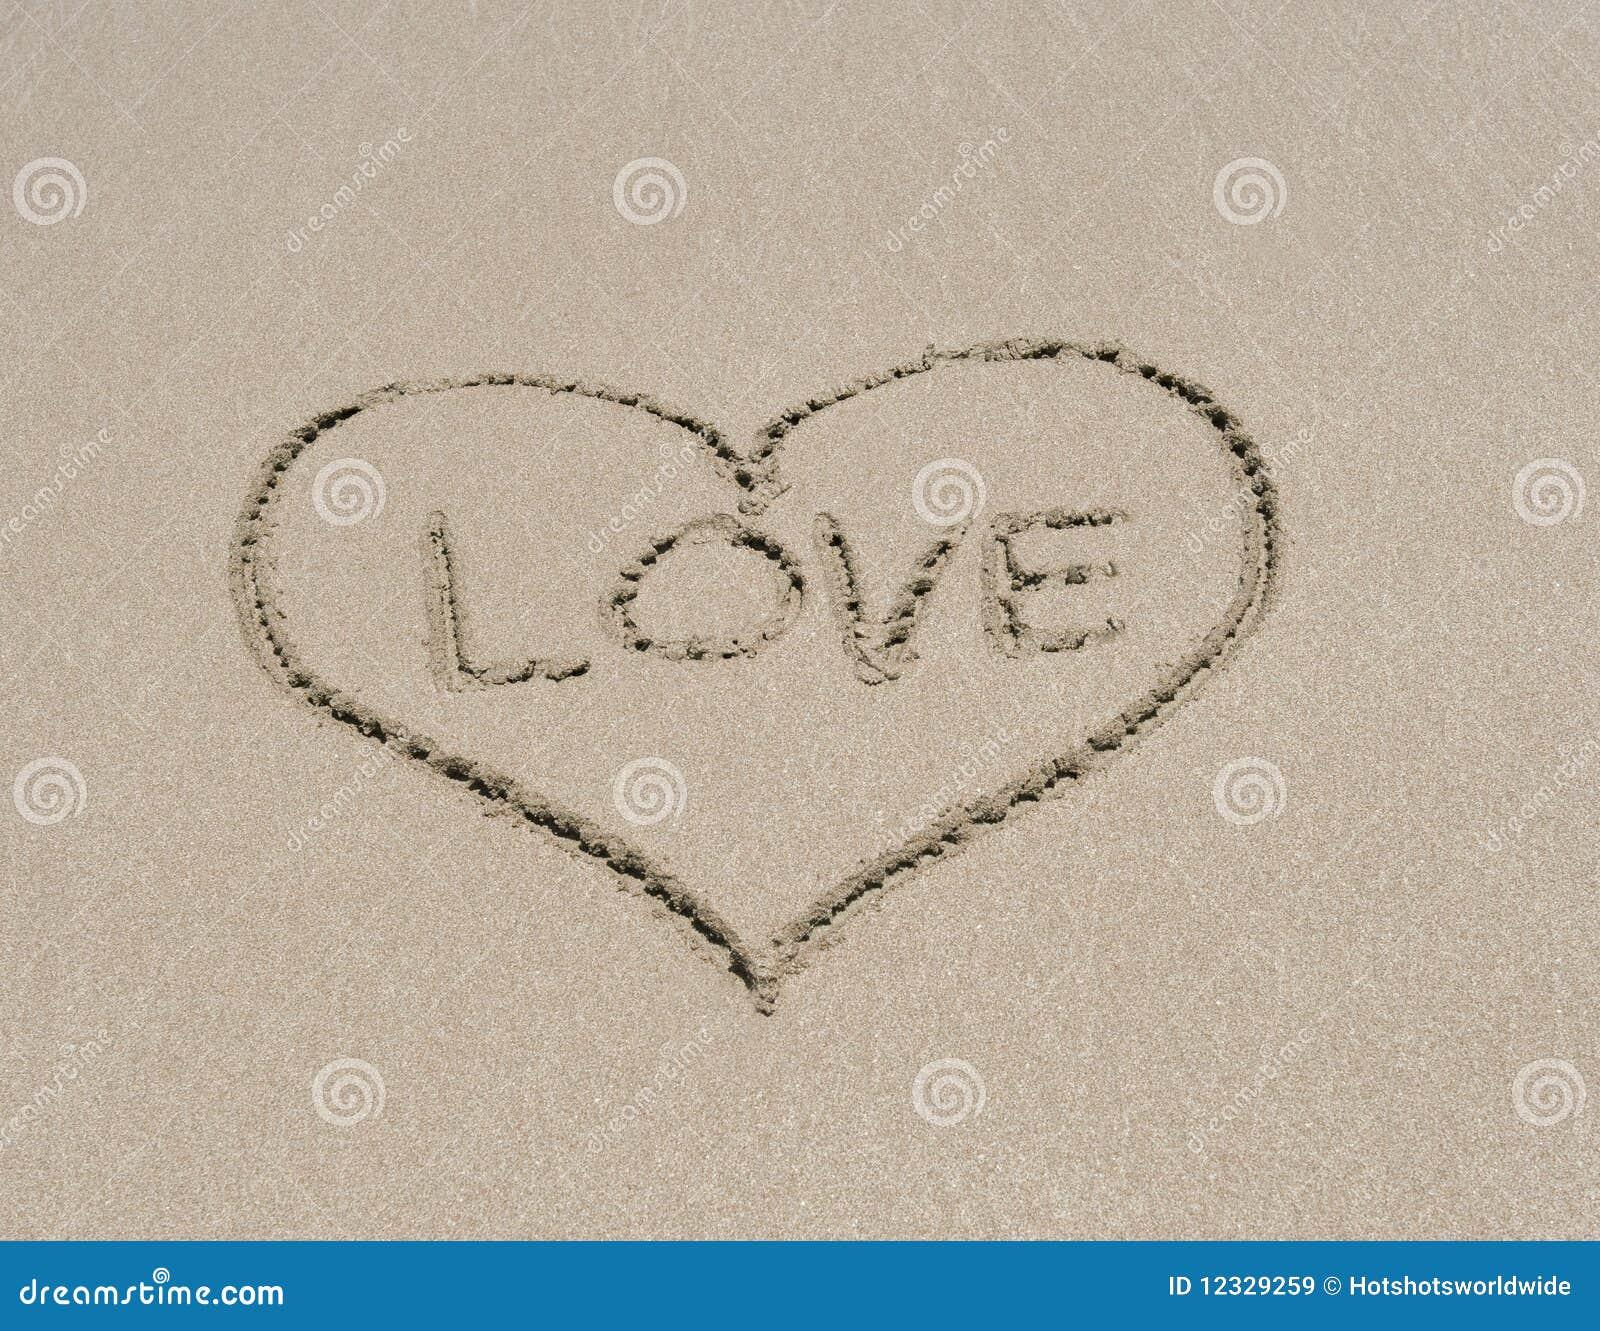 beach moments heart love - photo #22